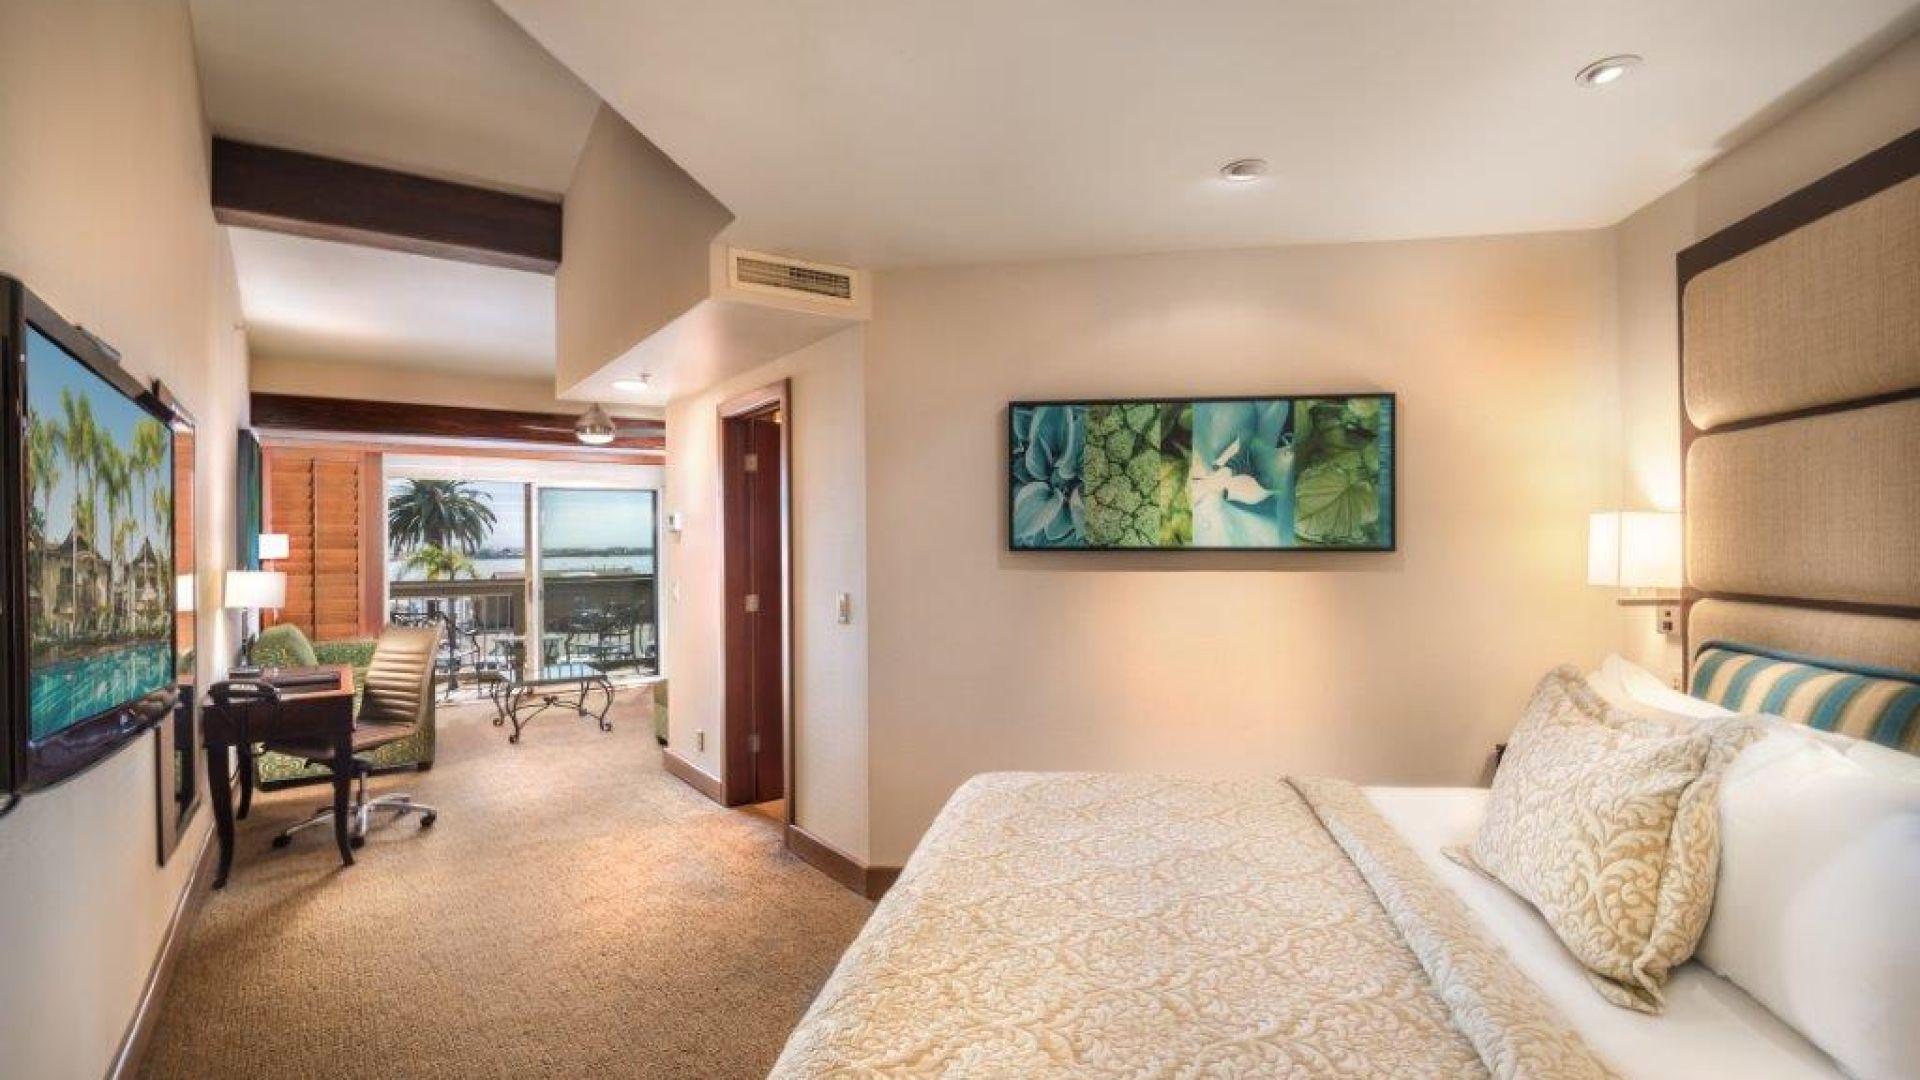 Humphreys Half Moon Inn: A Shelter Island San Diego Hotel